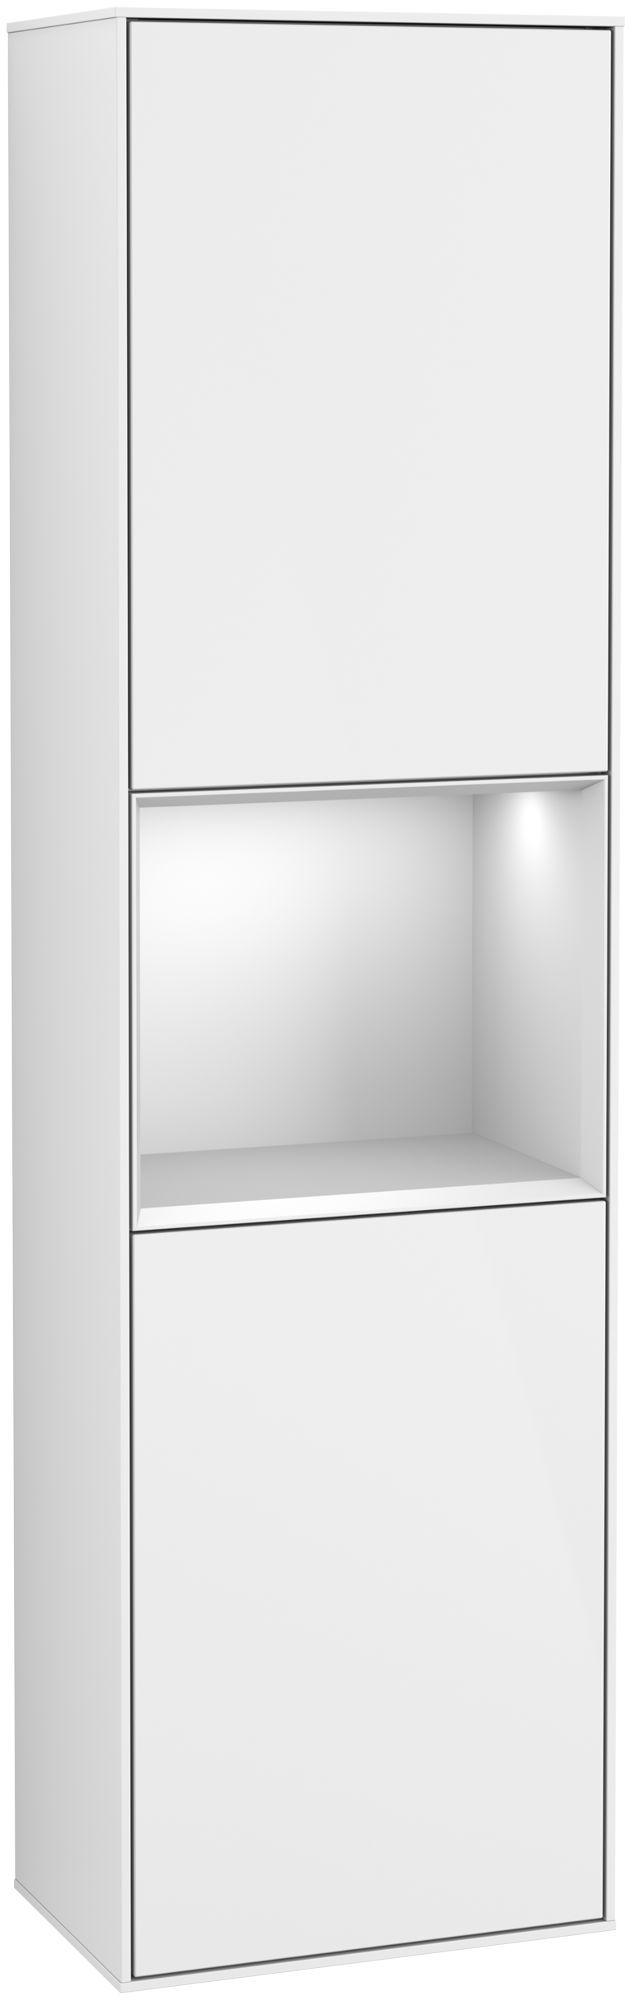 Villeroy & Boch Finion F47 Hochschrank mit Regalelement 2 Türen Anschlag rechts LED-Beleuchtung B:41,8xH:151,6xT:27cm Front, Korpus: Glossy White Lack, Regal: Weiß Matt Soft Grey F470MTGF